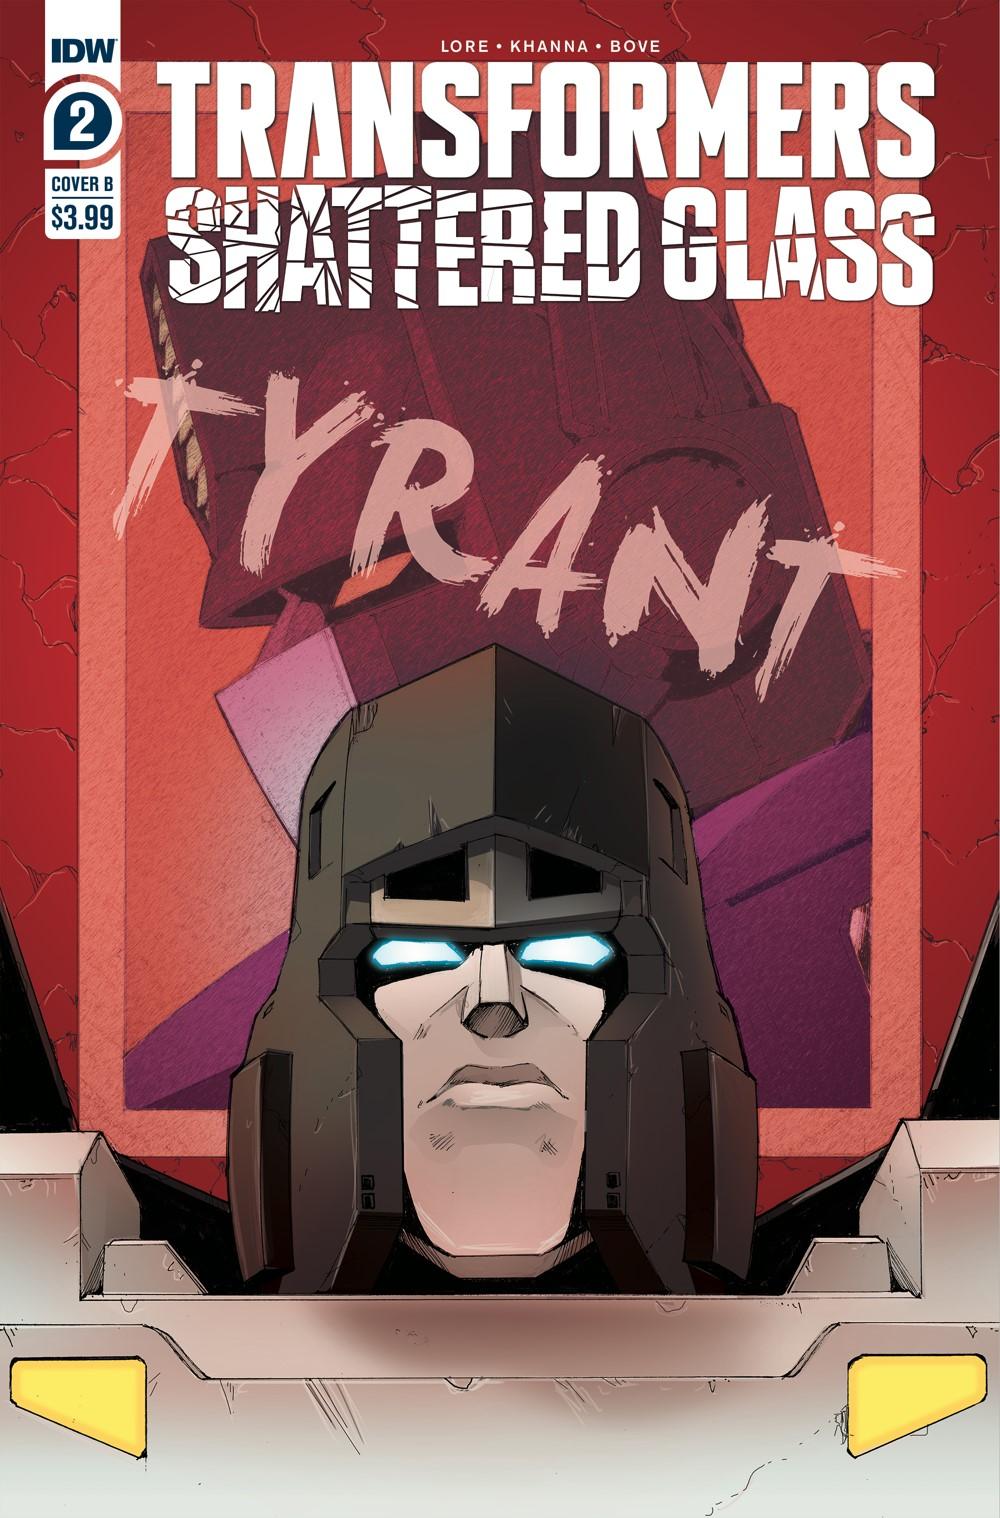 TF_ShatGlass02-cvrB ComicList: IDW Publishing New Releases for 09/29/2021